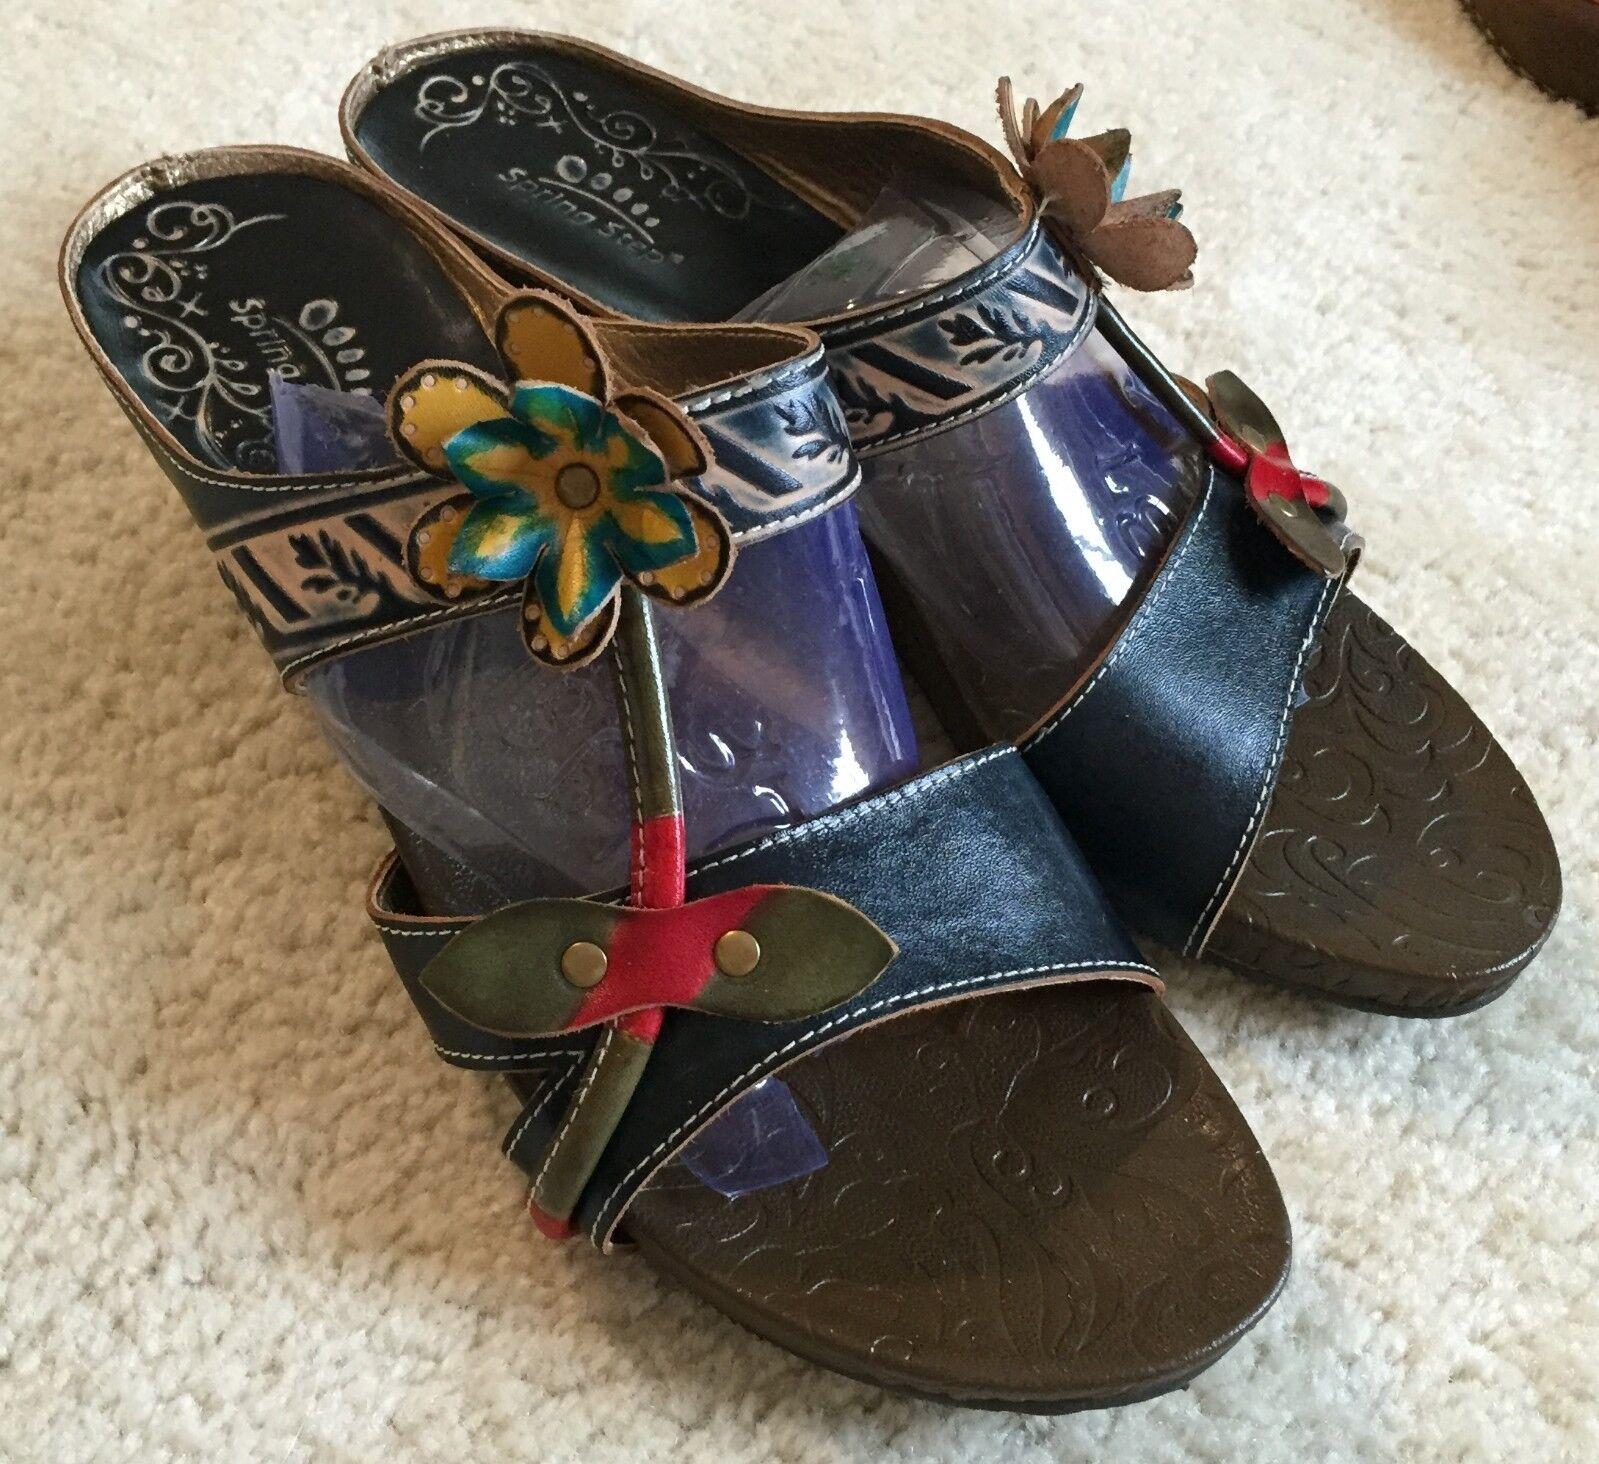 Women's Spring Step Tropic Wedge 10 Sandals  41 / 10 Wedge - 10.5 M  $70 c0c931